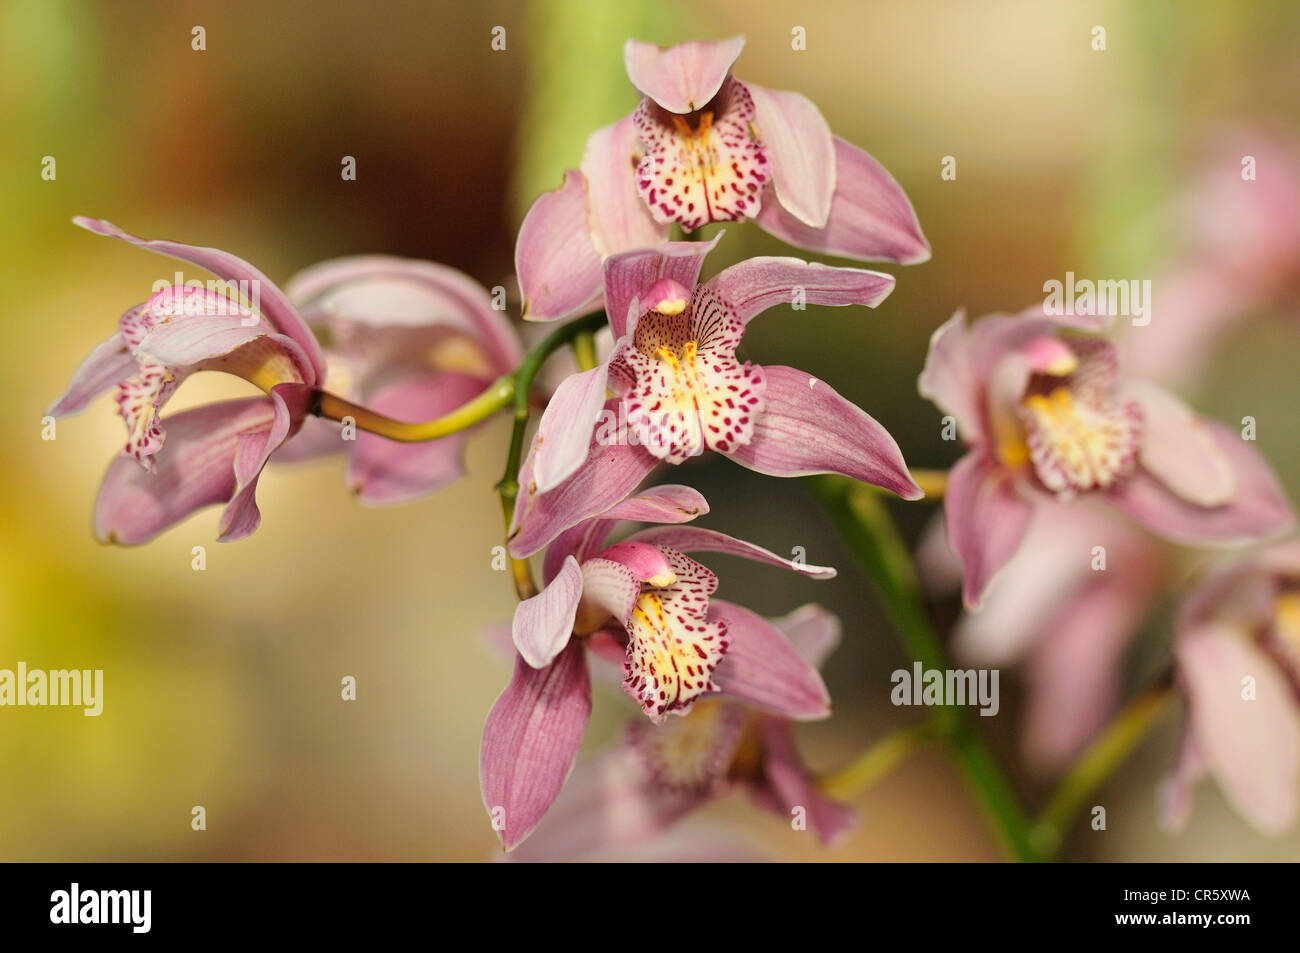 Orchid, Tegallalang market, Ubud, Bali, Indonesia, Asia, - Stock Image